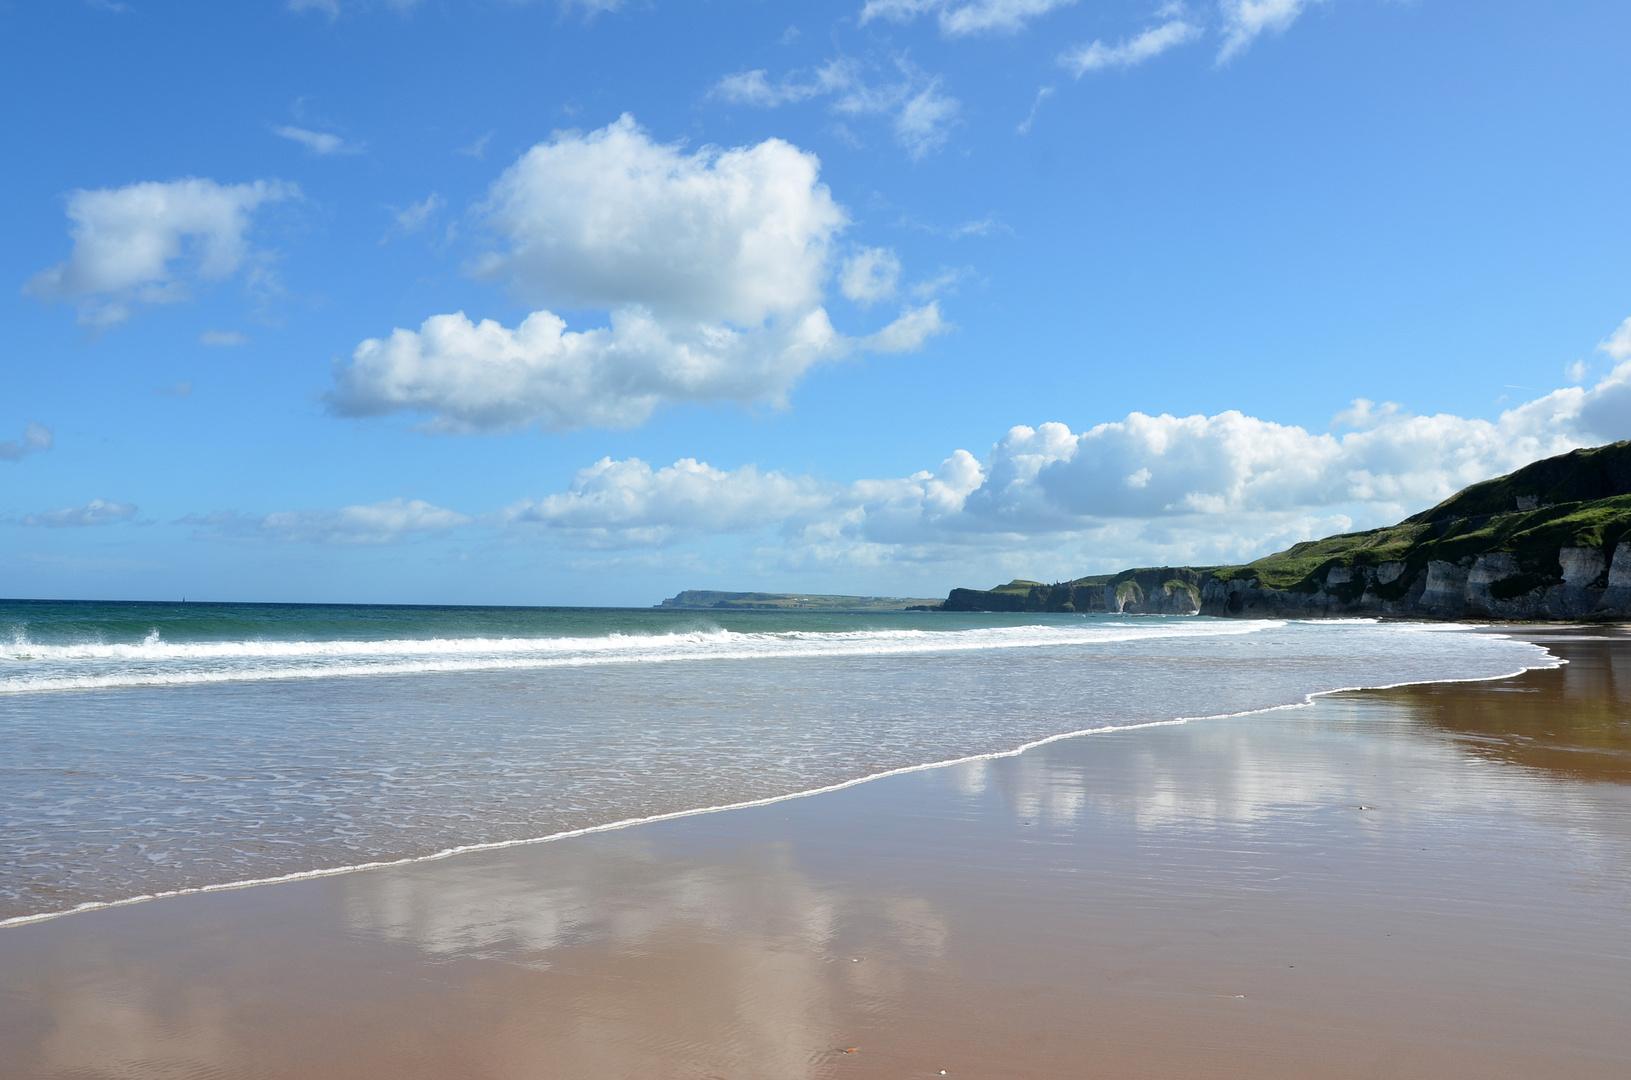 Portrush Whiterocks Beach - Antrim - Northern Ireland